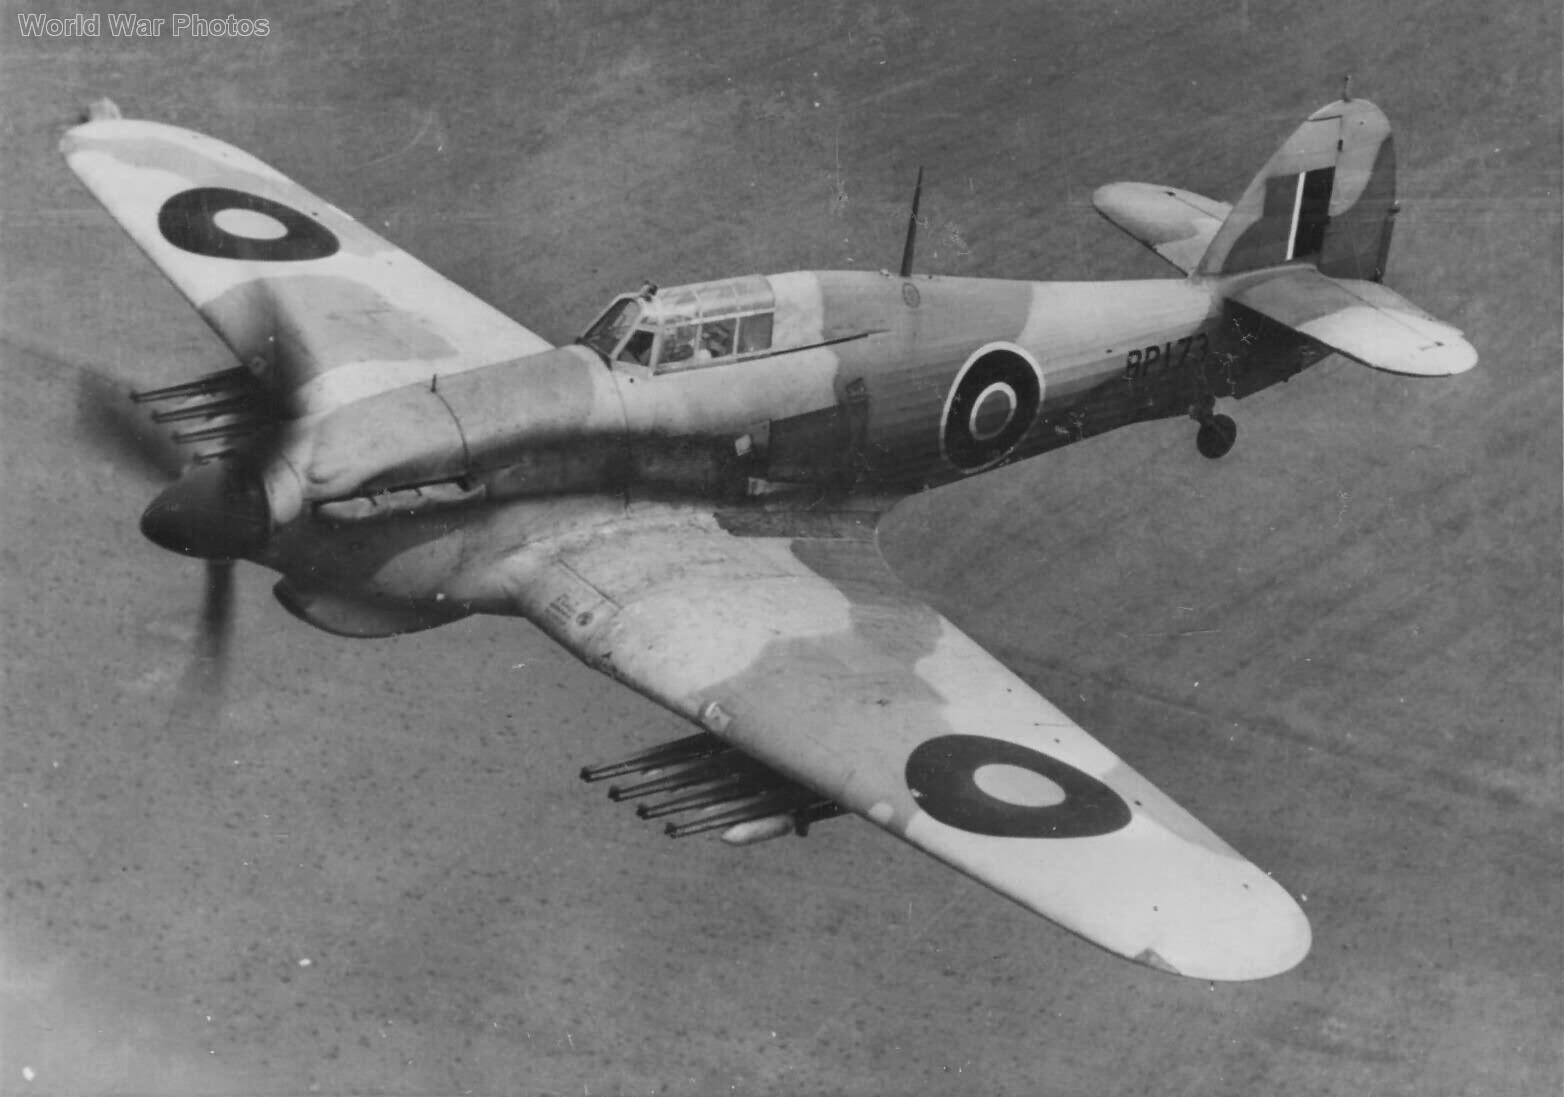 Hawker Hurricane Mk IV with rocket rails